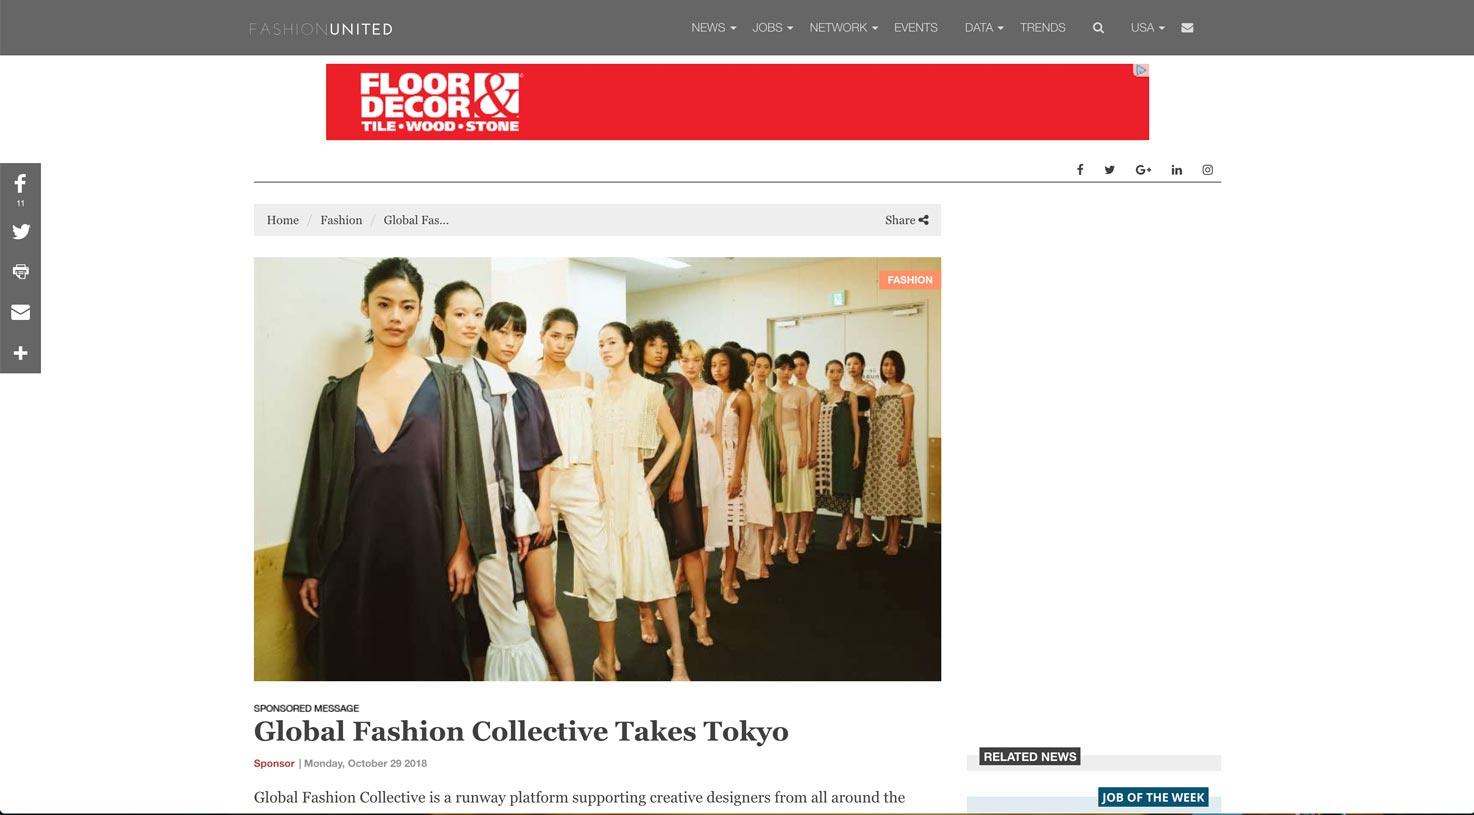 Global Fashion Collective Takes Tokyo | Fashion United